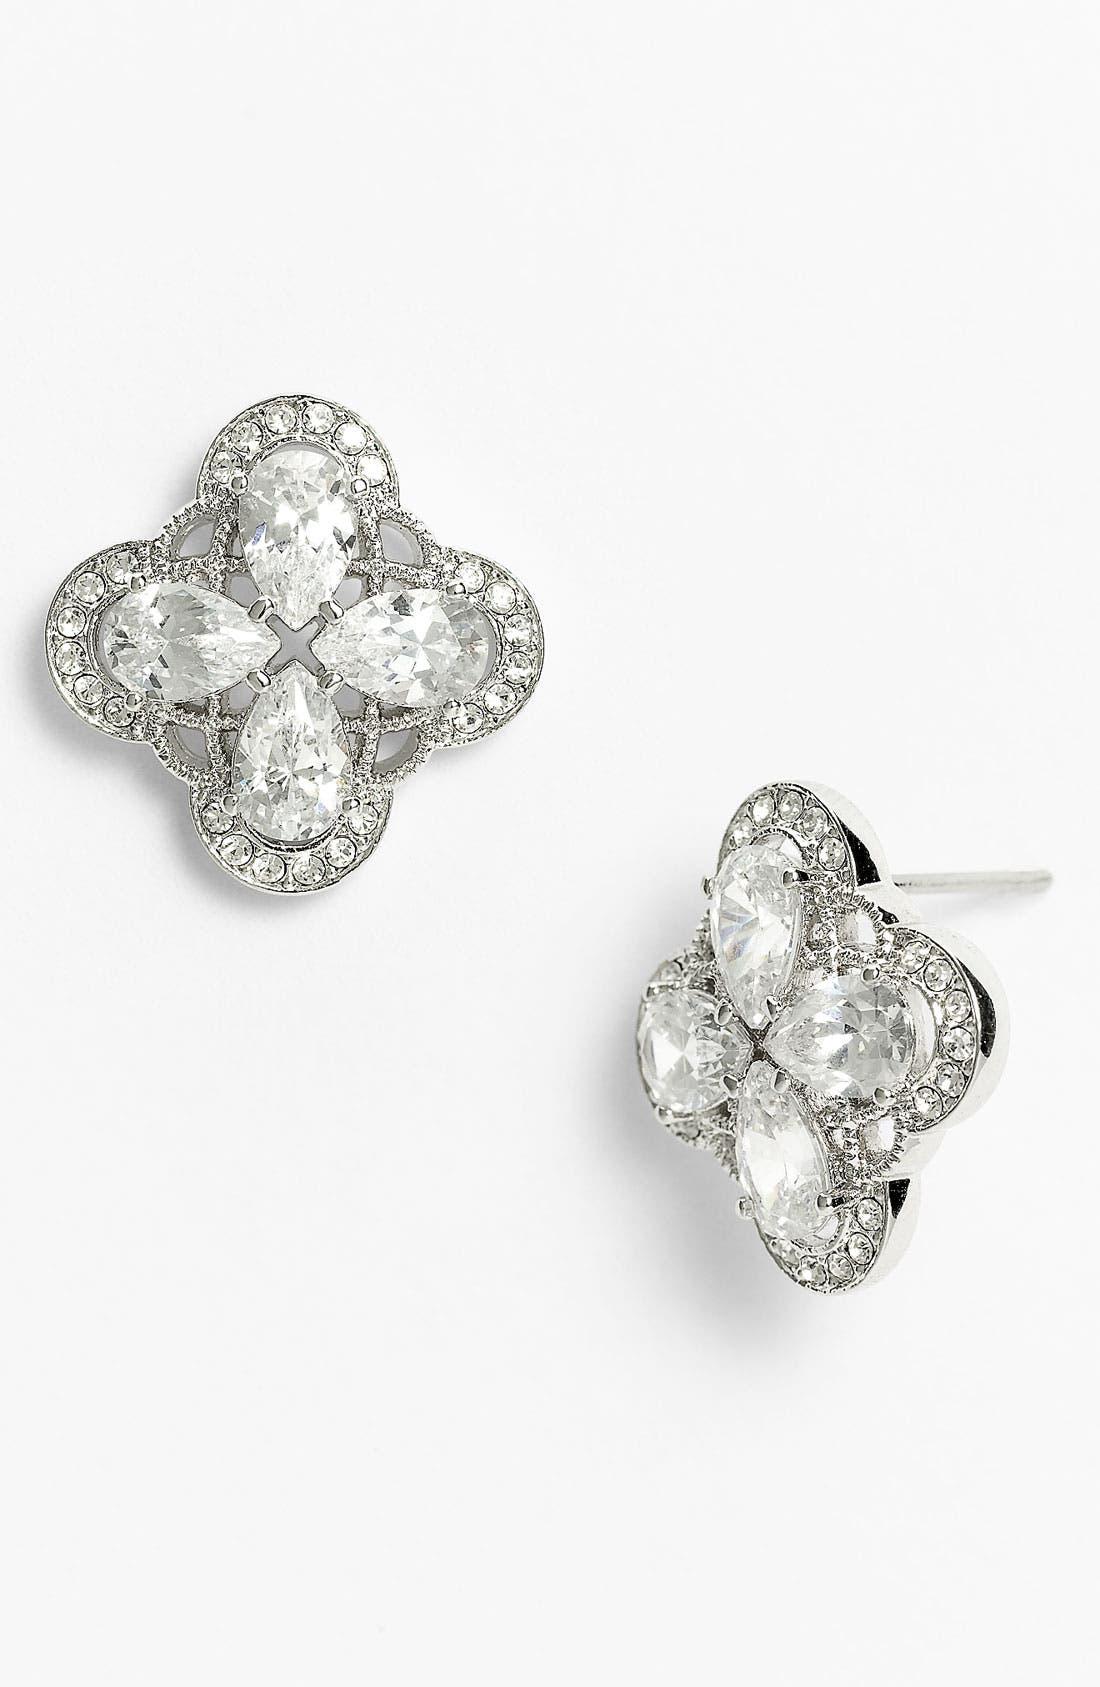 Main Image - Nadri 'Ariel' Button Stud Earrings (Nordstrom Exclusive)